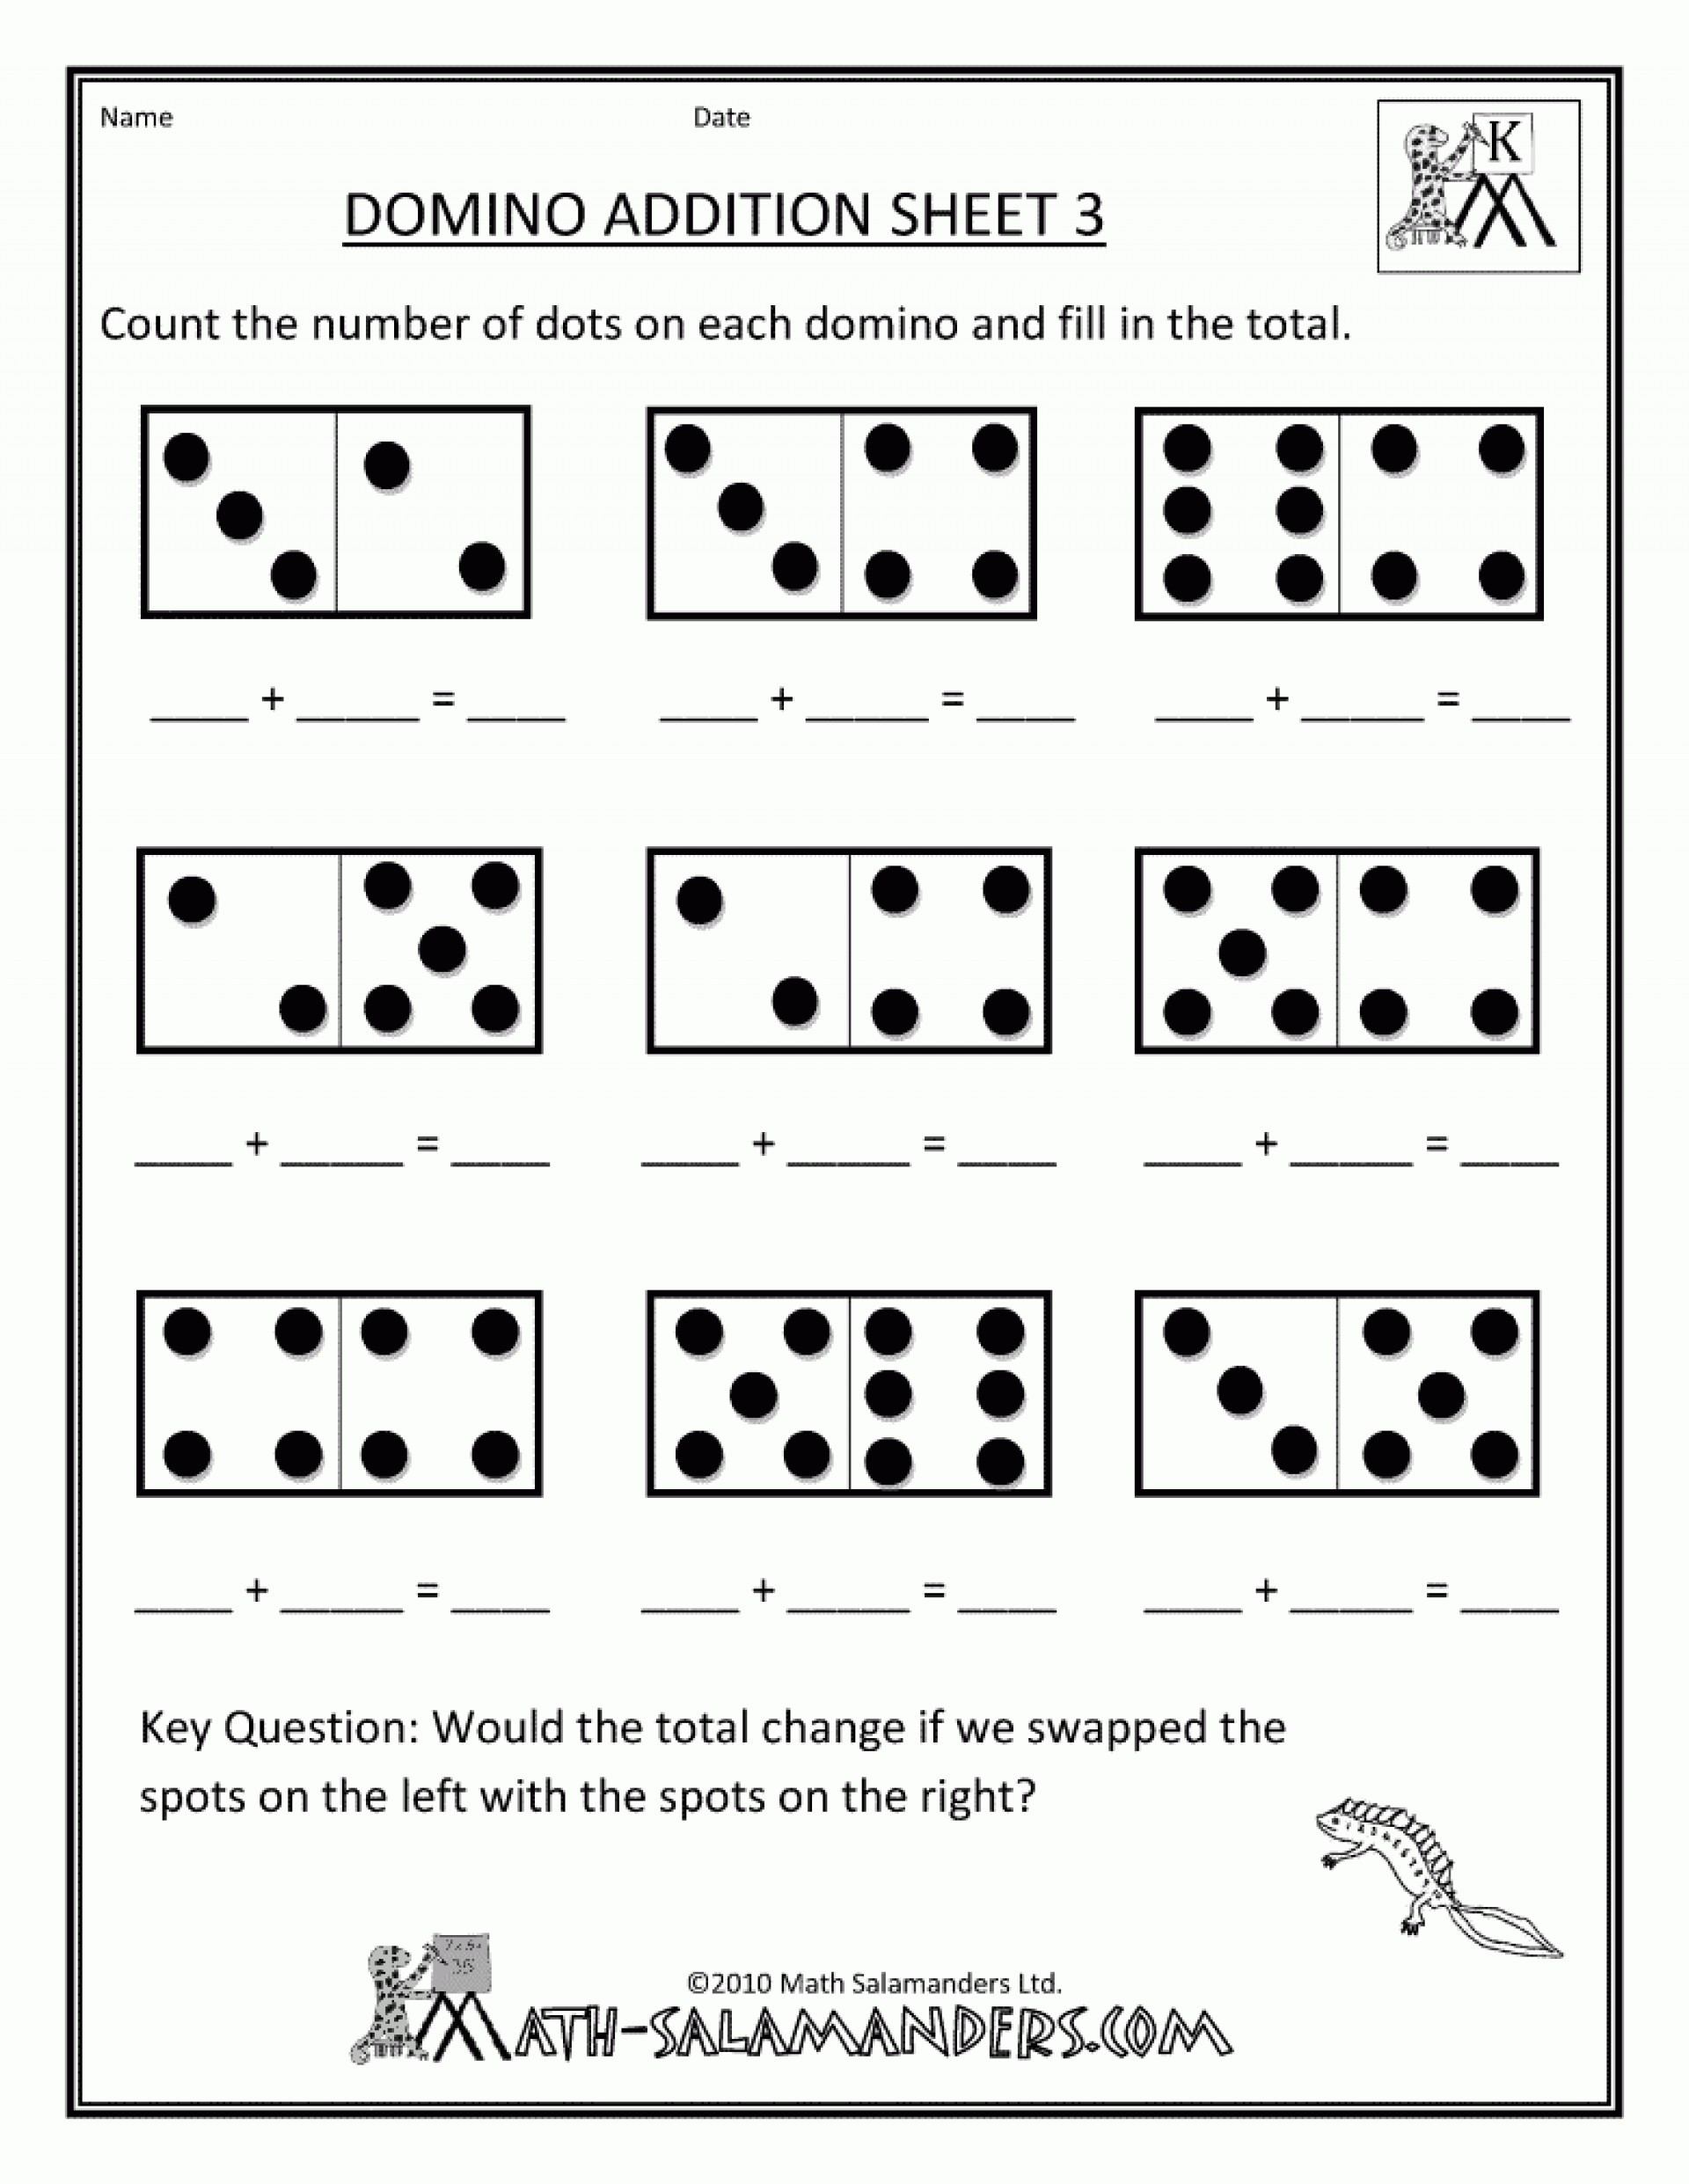 Preschool Addition Worksheets Printable Printable Preschool Math Pages Clover Hatunisi